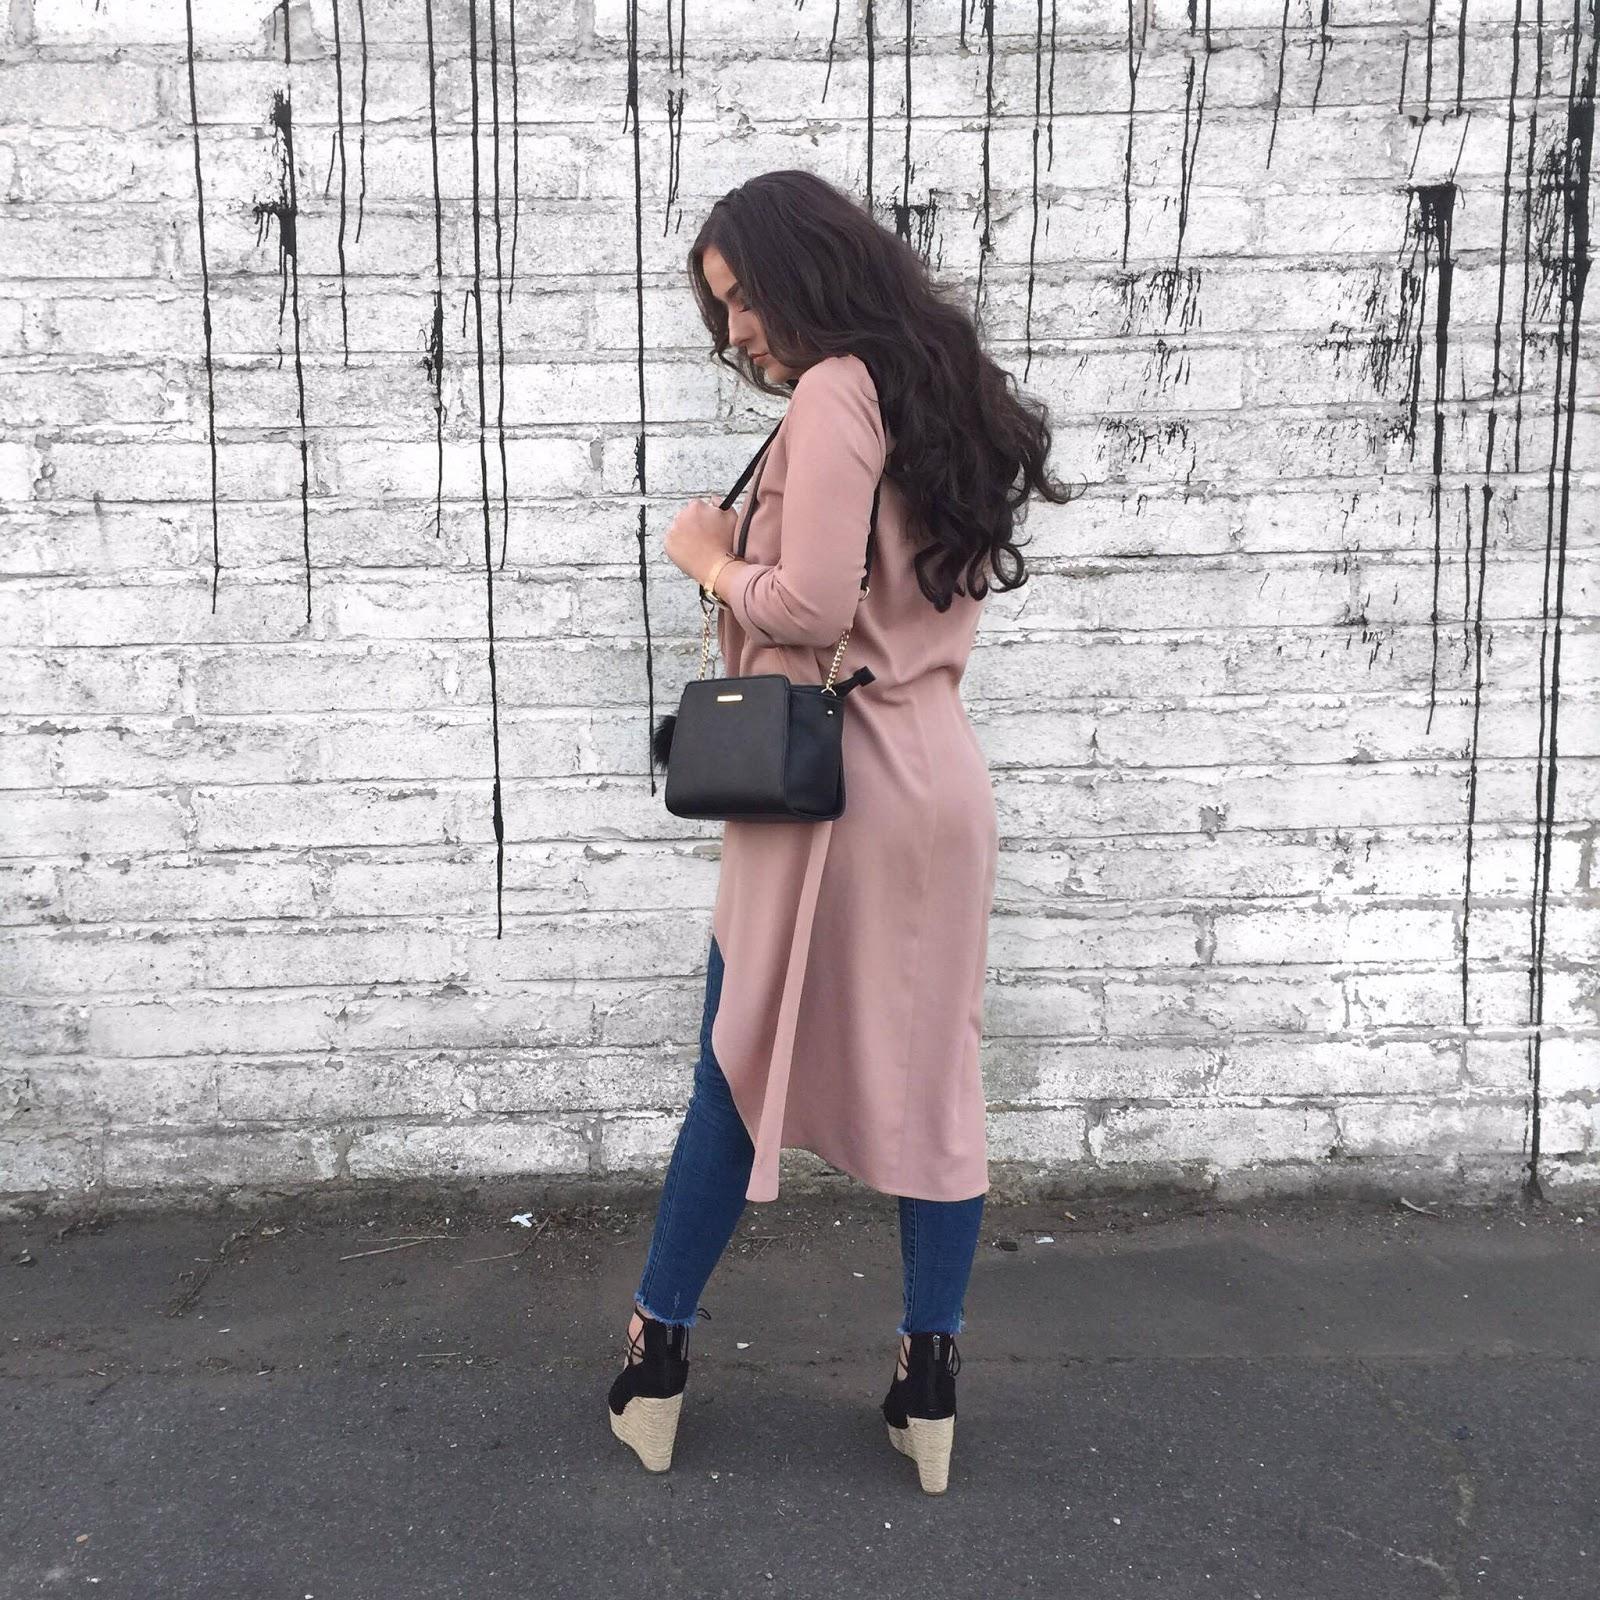 North East Blogger Ellie Rees